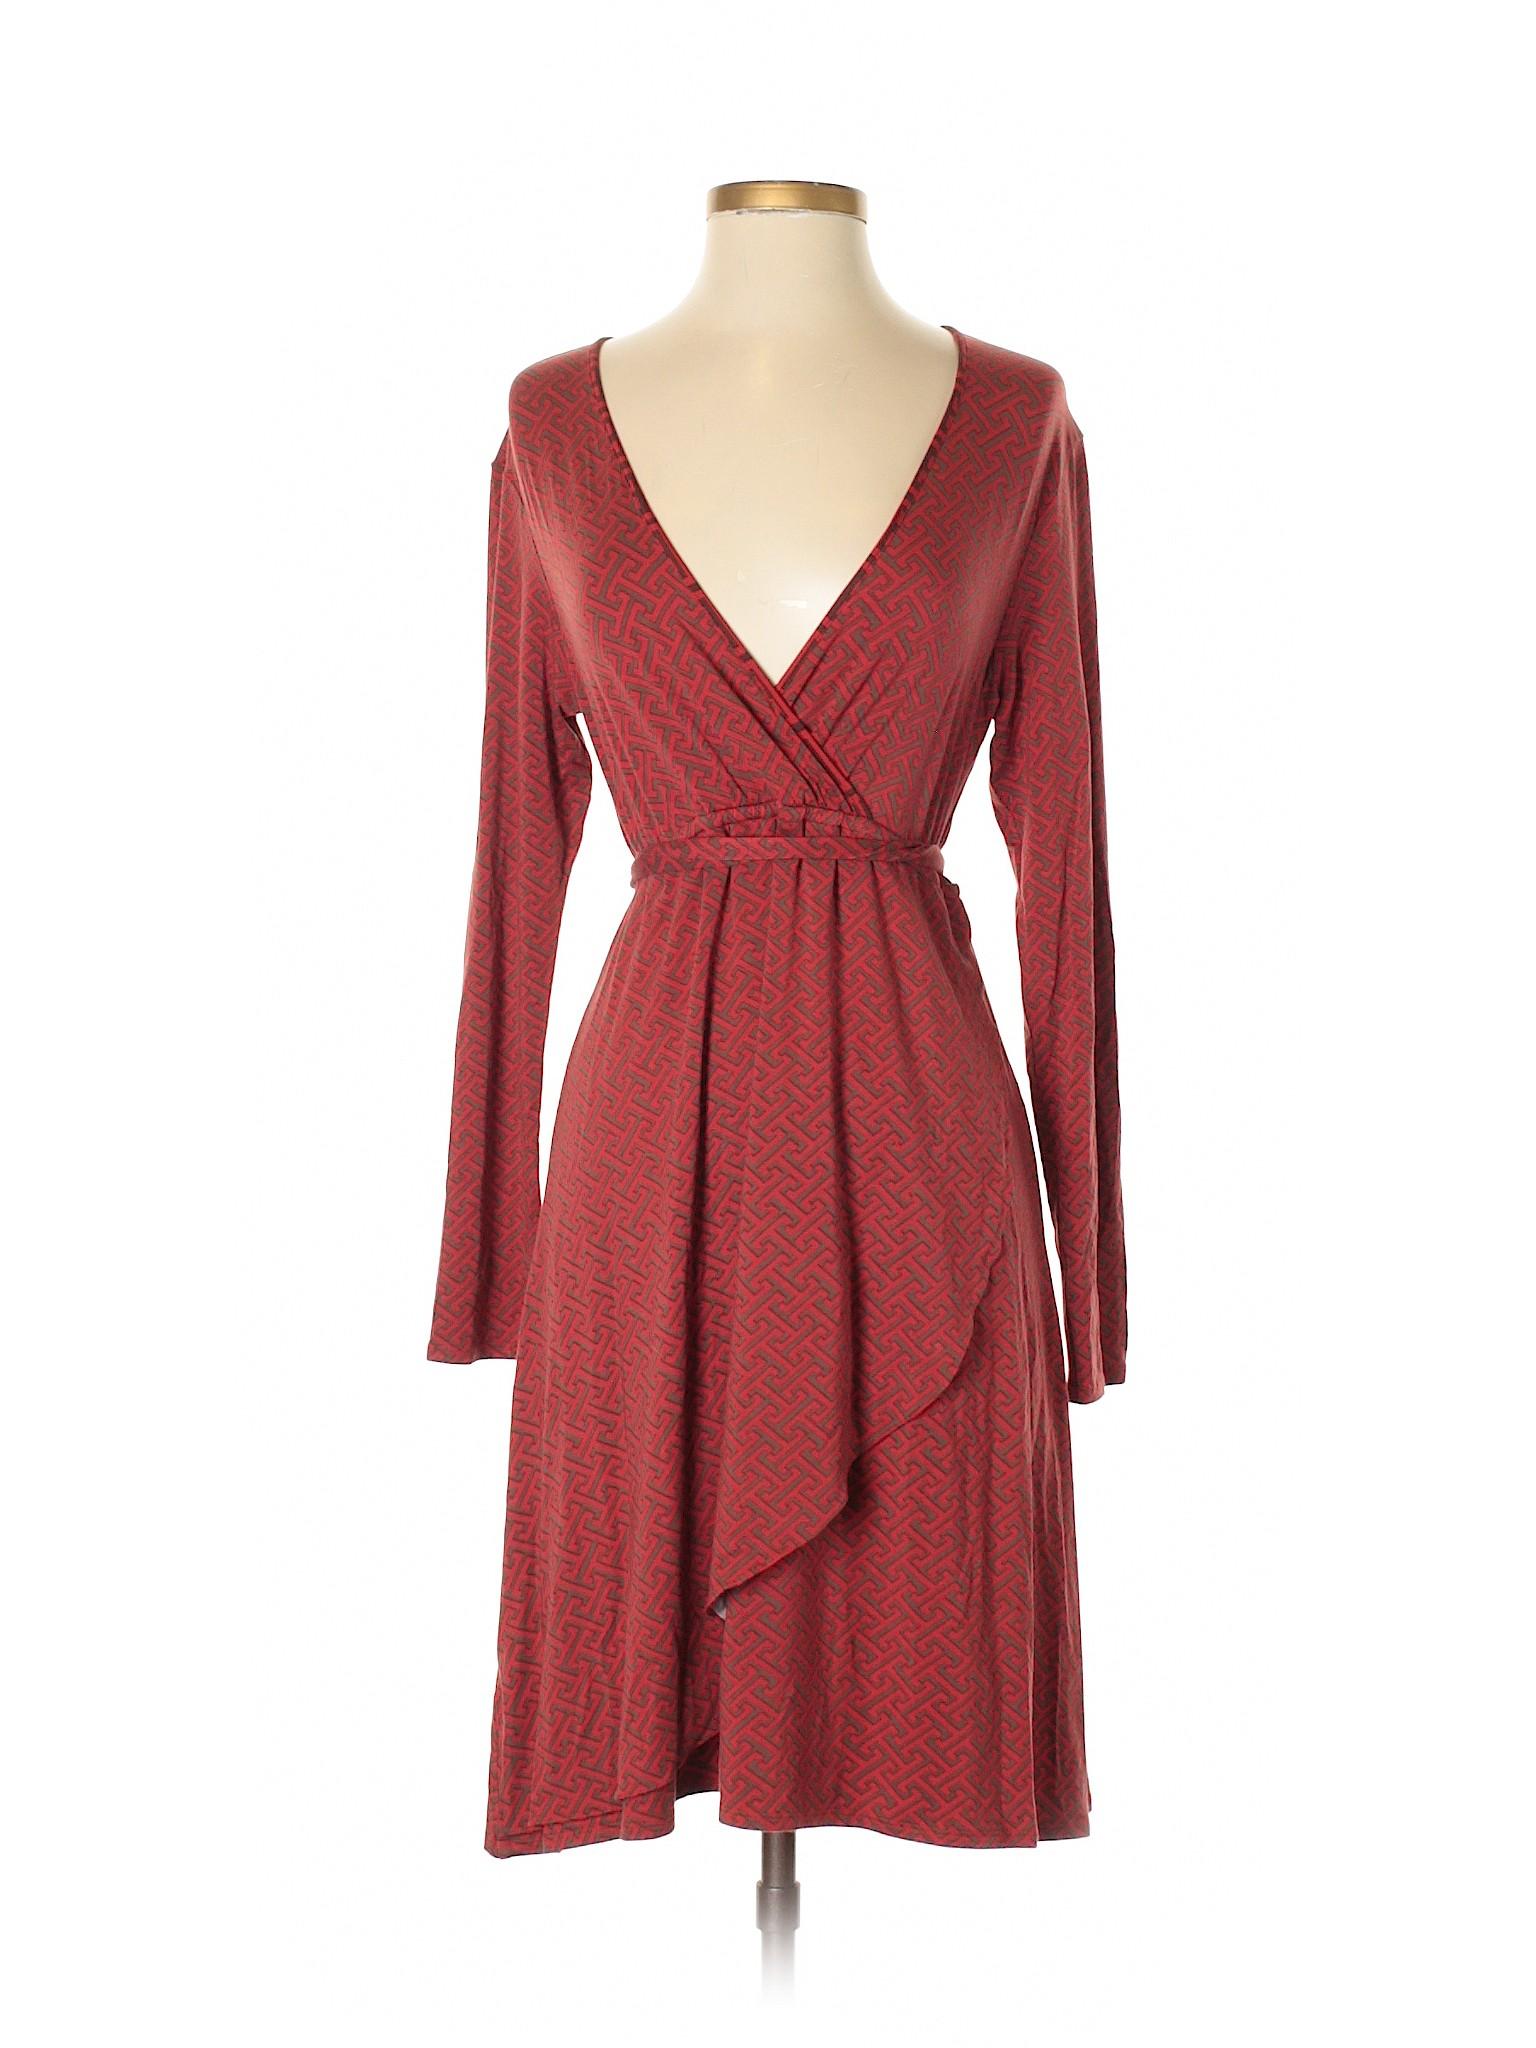 Me More of Casual winter Dress Boutique q8UanxOfq